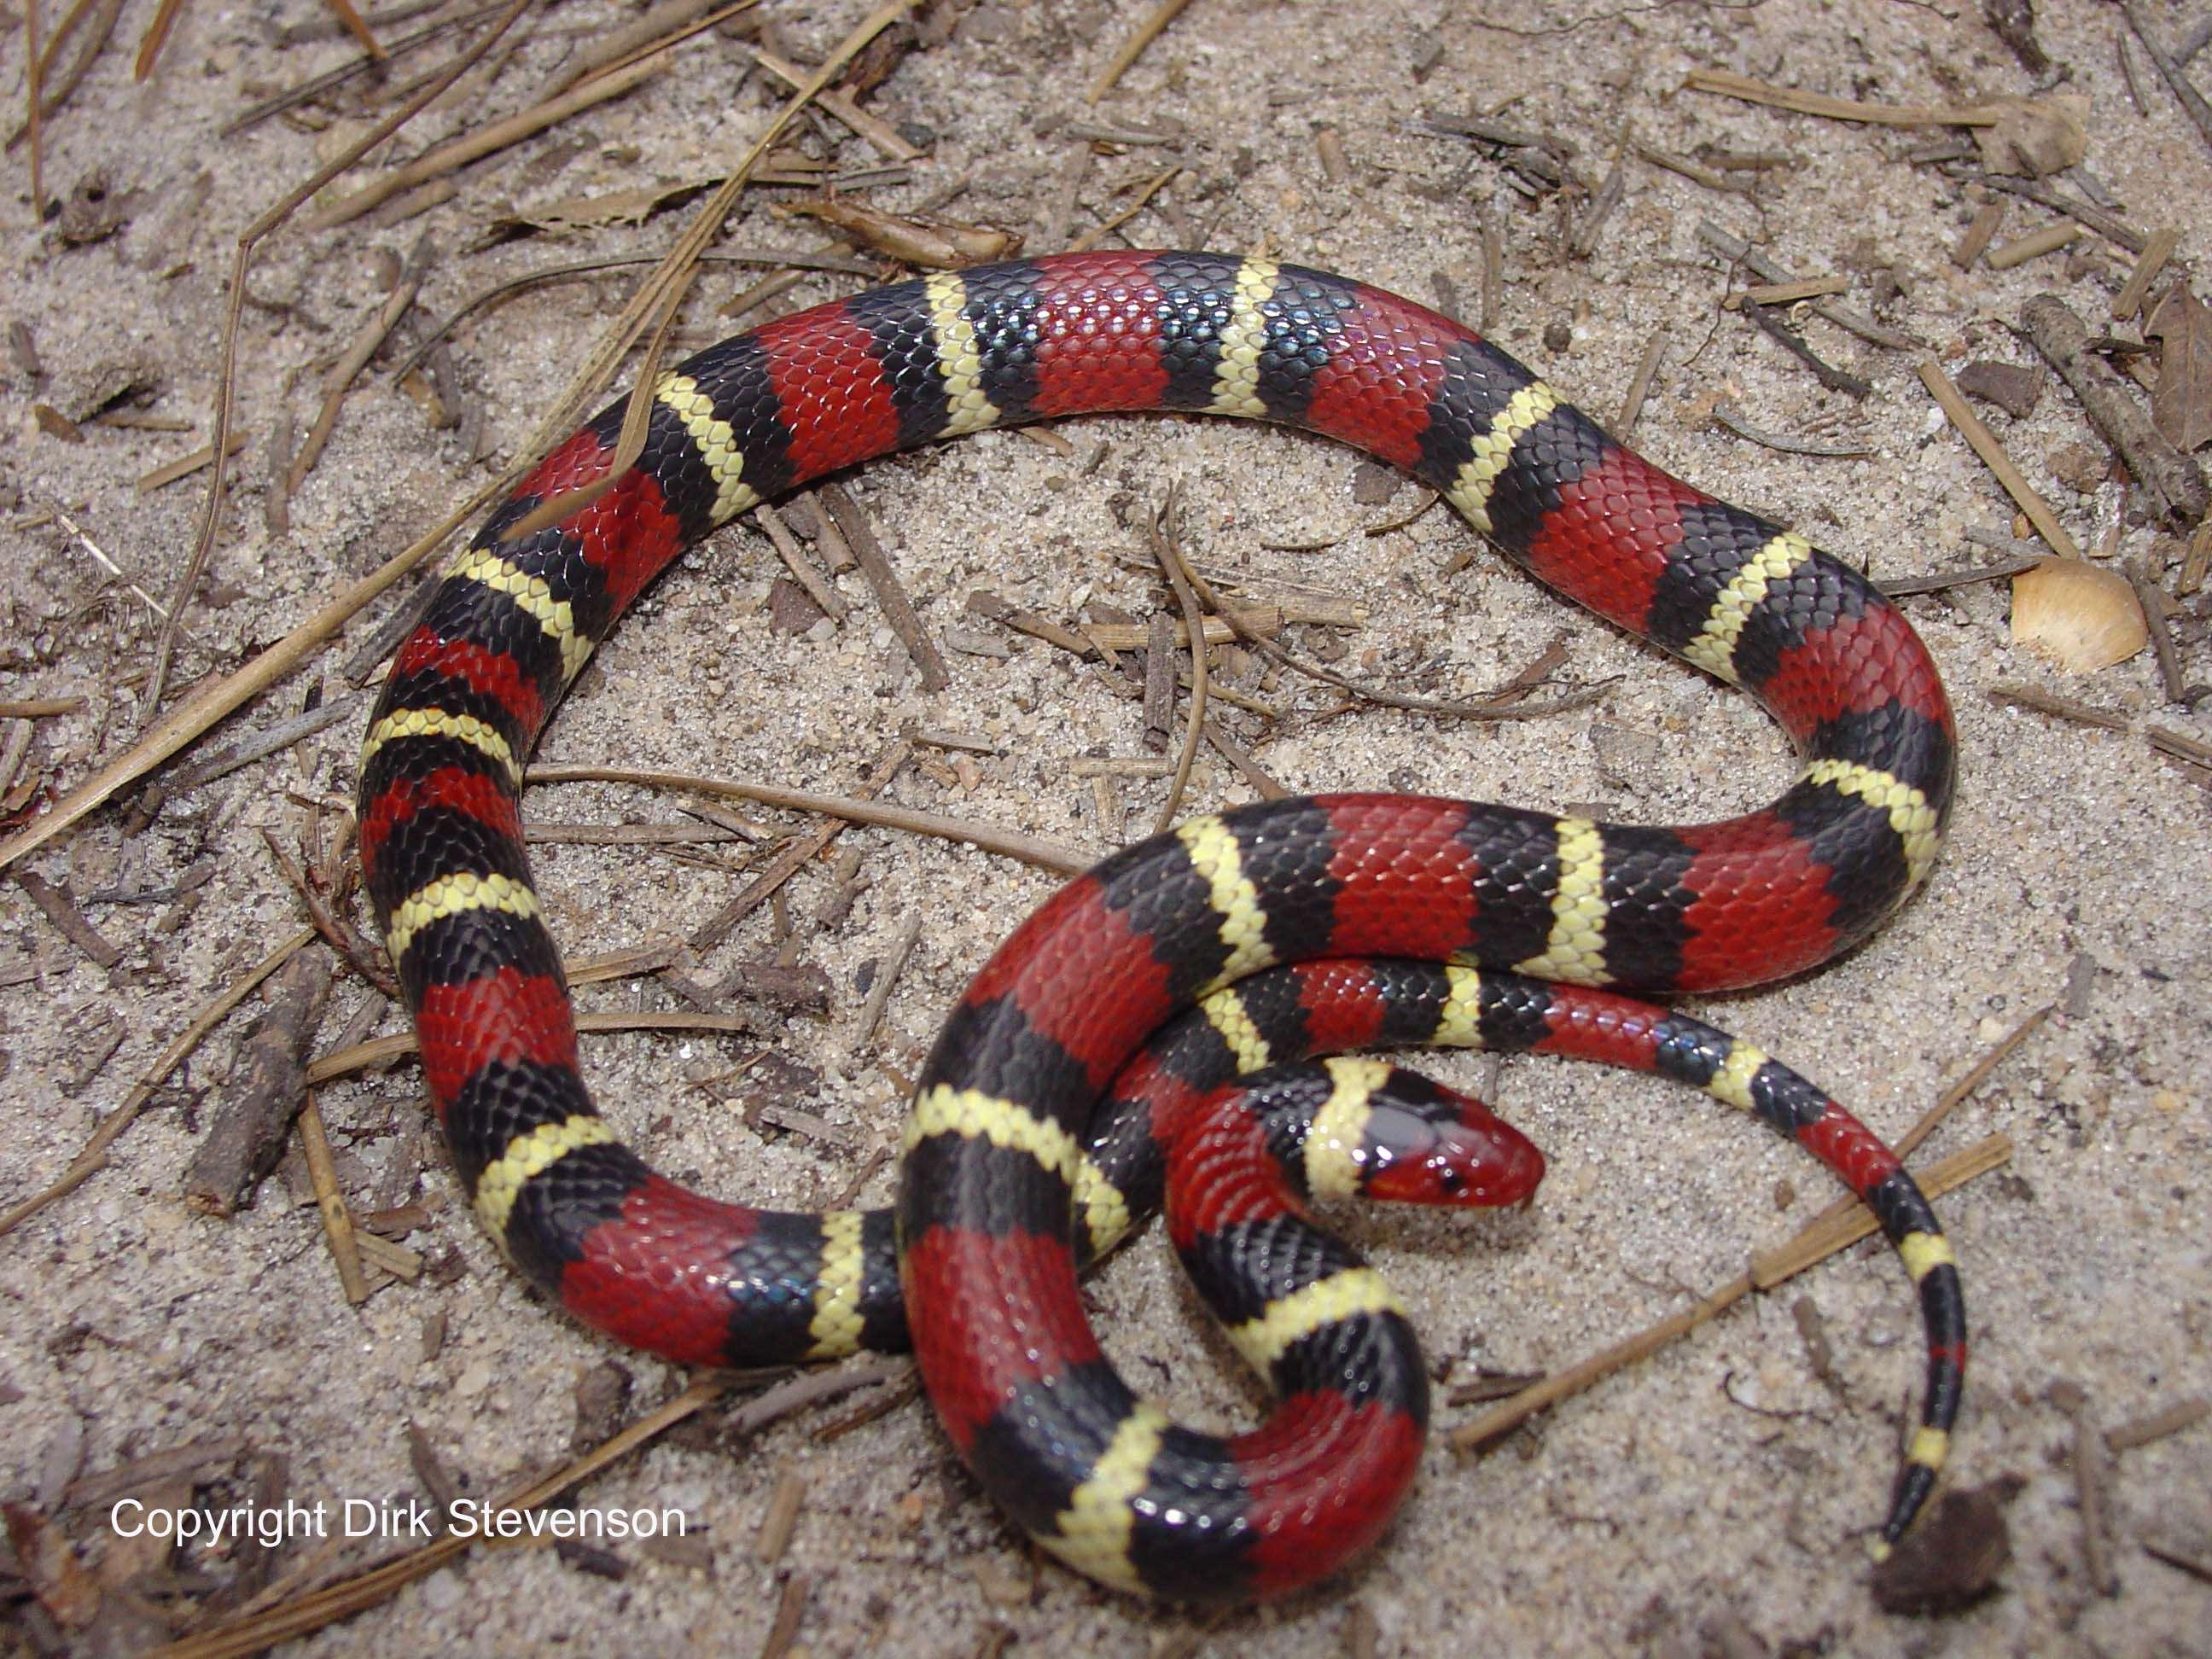 Afraid of snake...